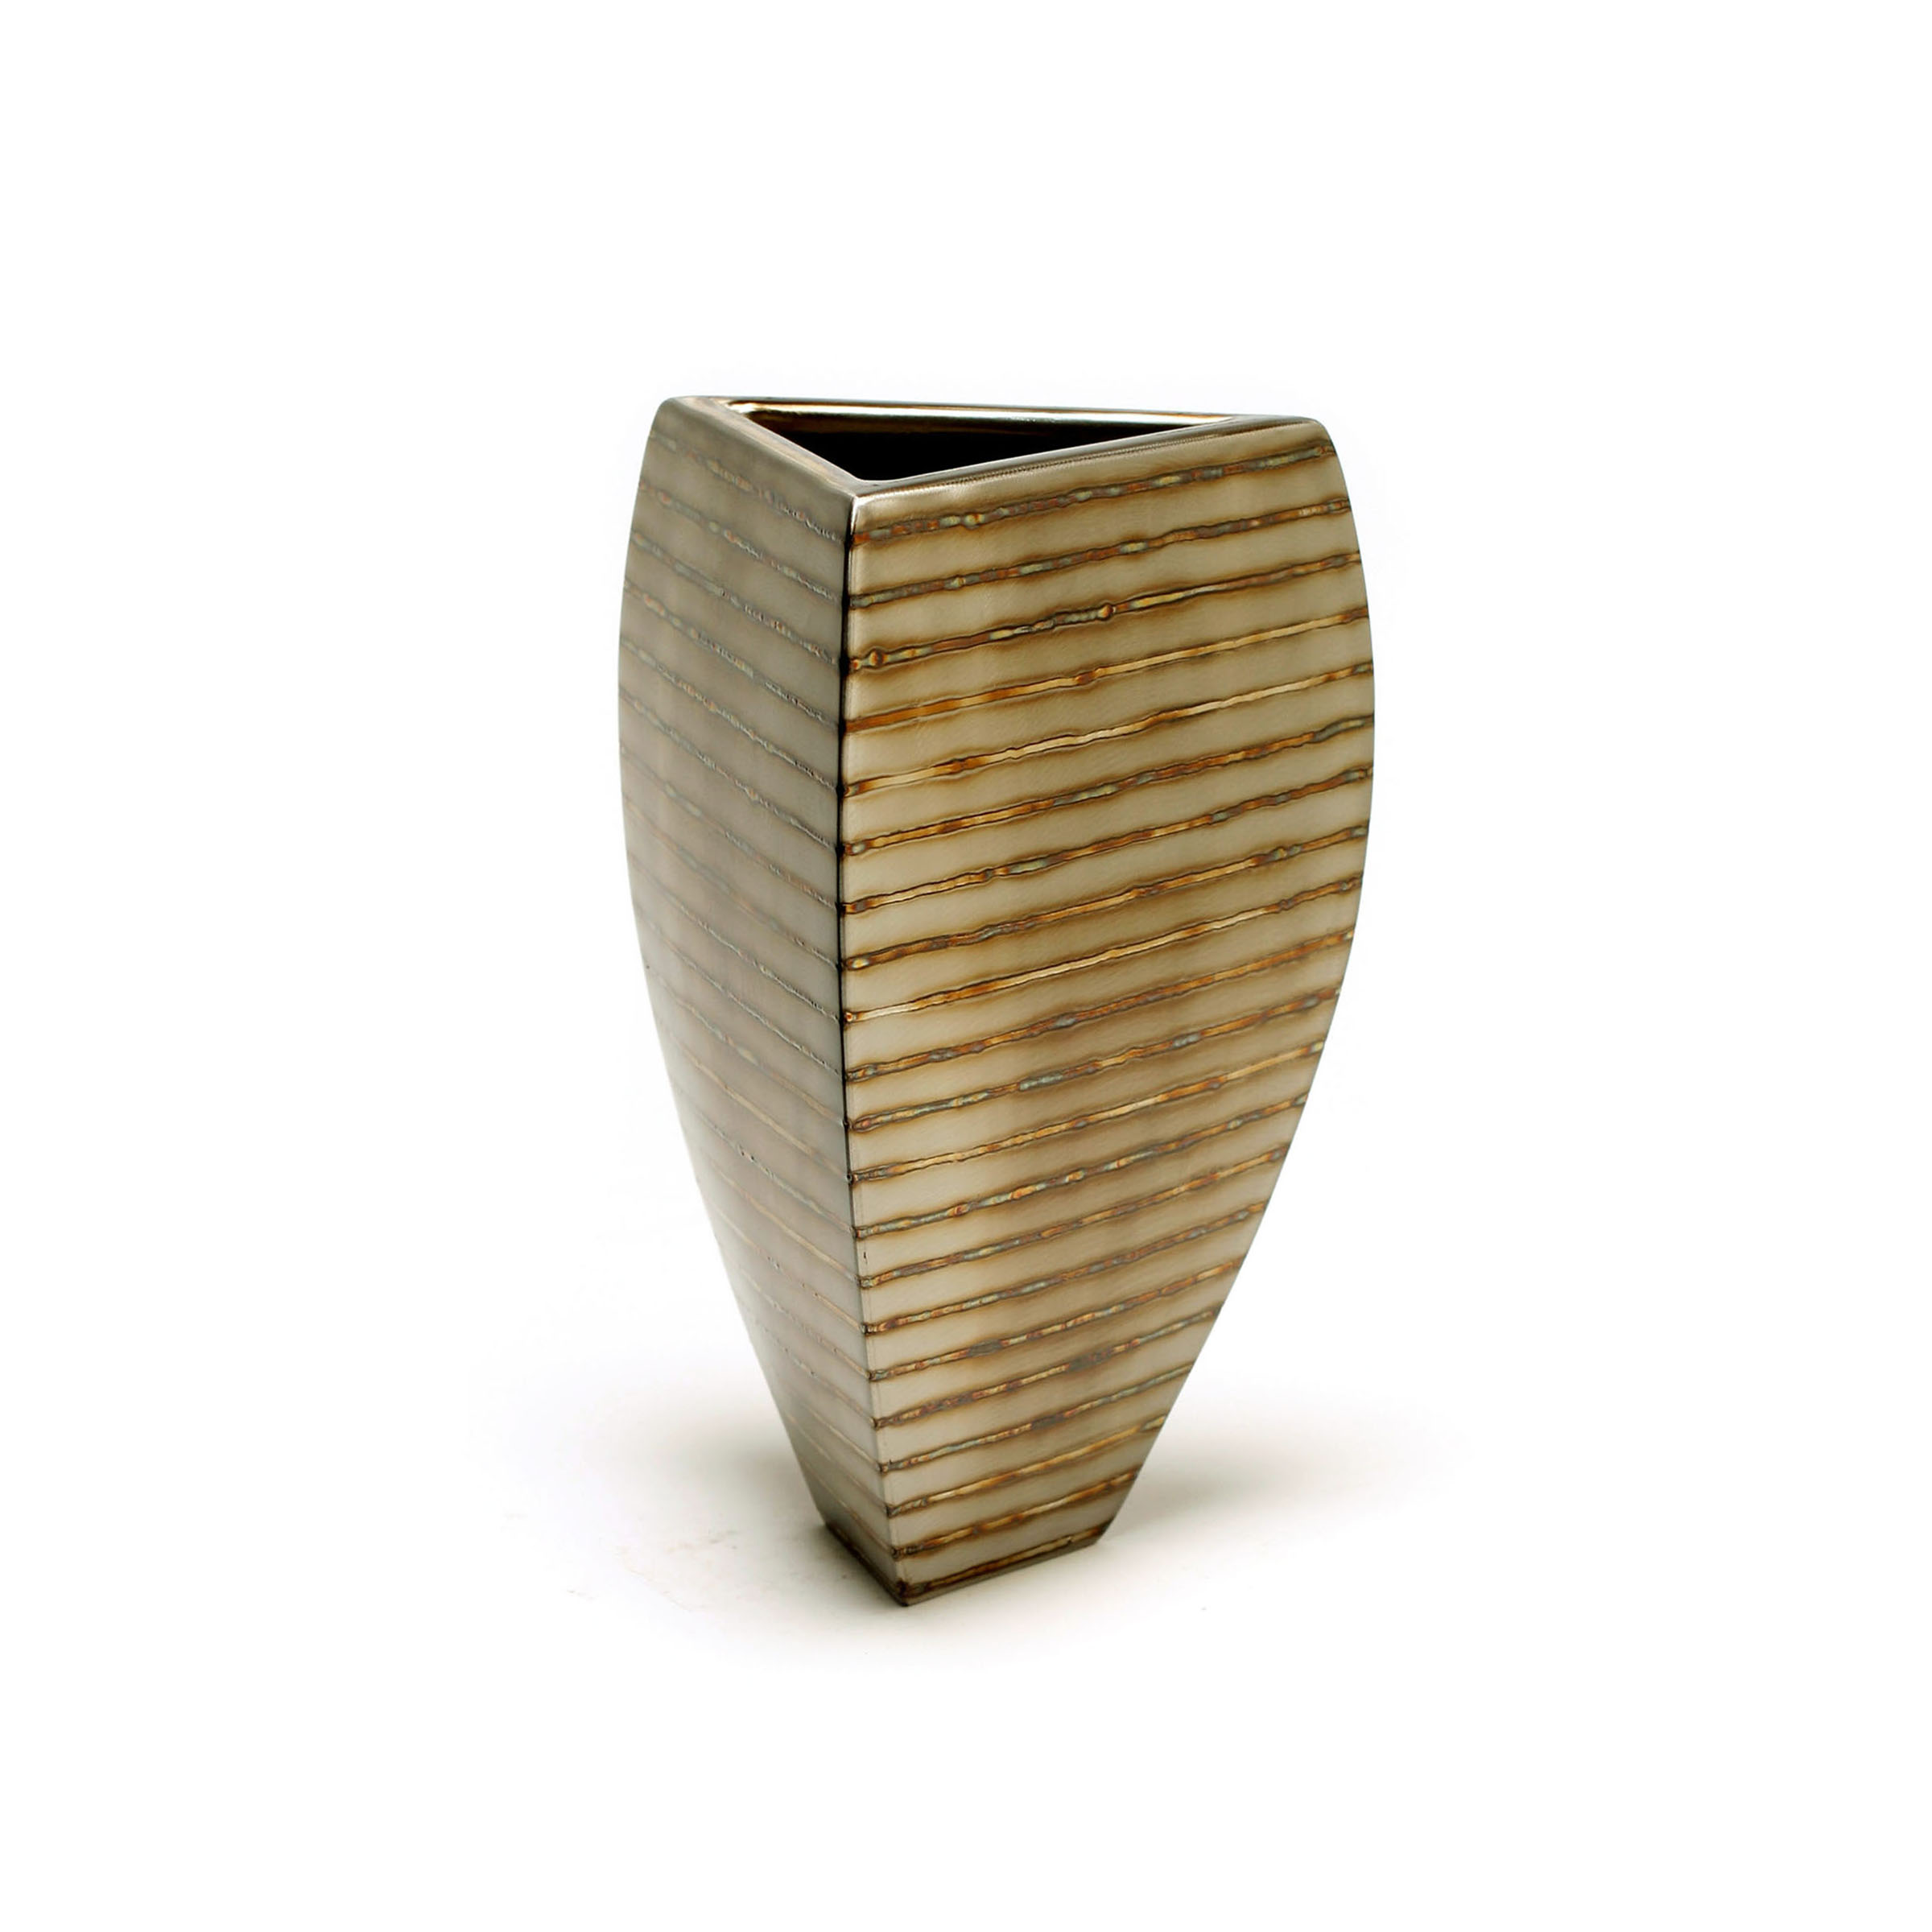 "Tri-Bowl - horizontal stripe , 10 x 7"" x 7"", Stainless Steel"